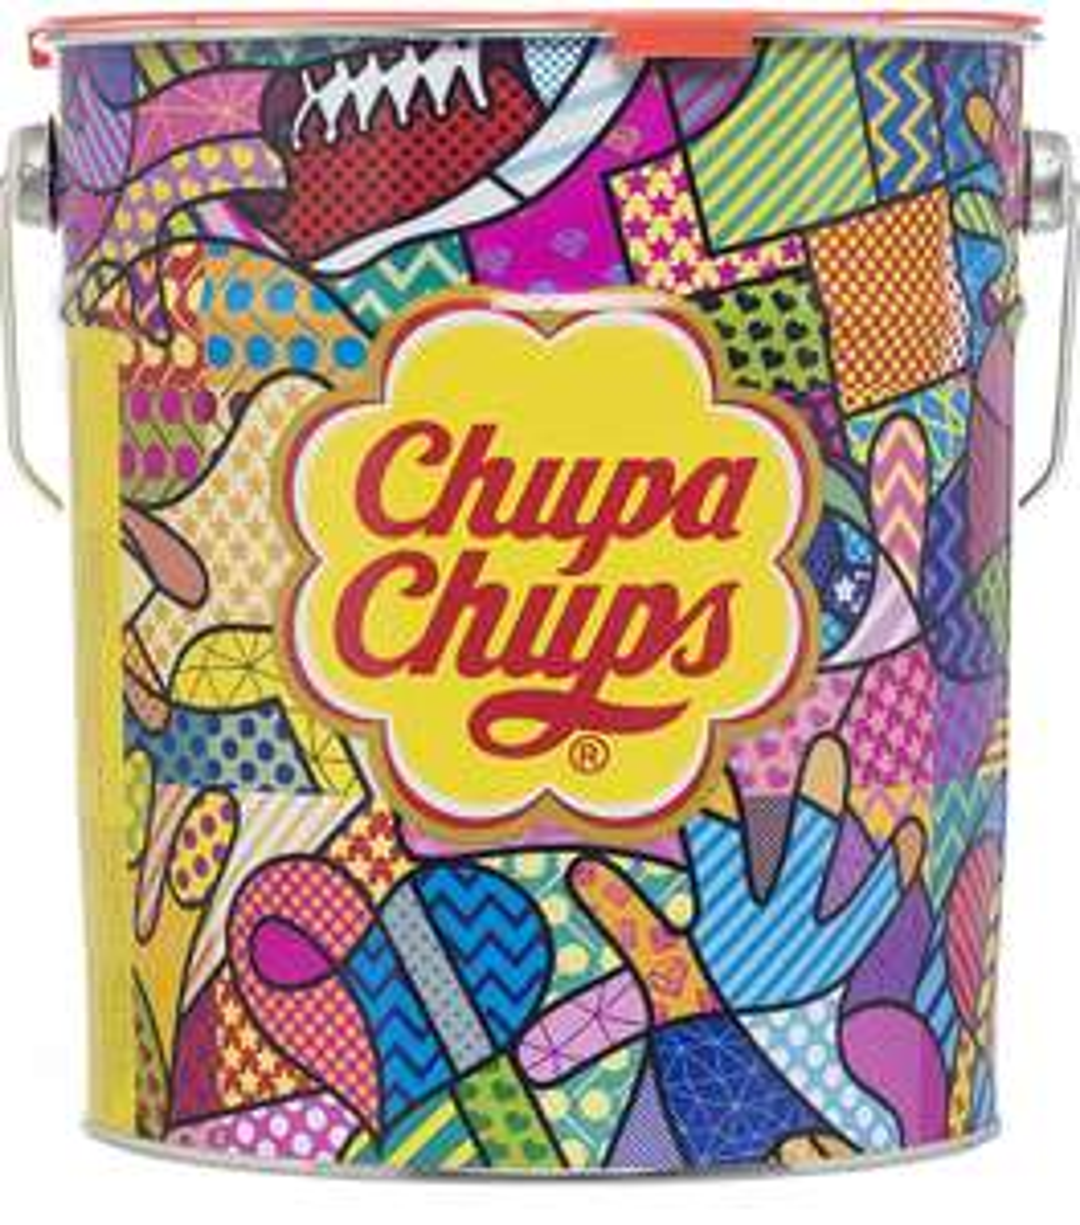 [Prime] Chupa Chups Best of Lollipop-Eimer, 150 Lutscher in der Aufbewahrungsdose, Pop-Art Metalldose, 6 fruchtig-cremige Geschmacksrichtungen